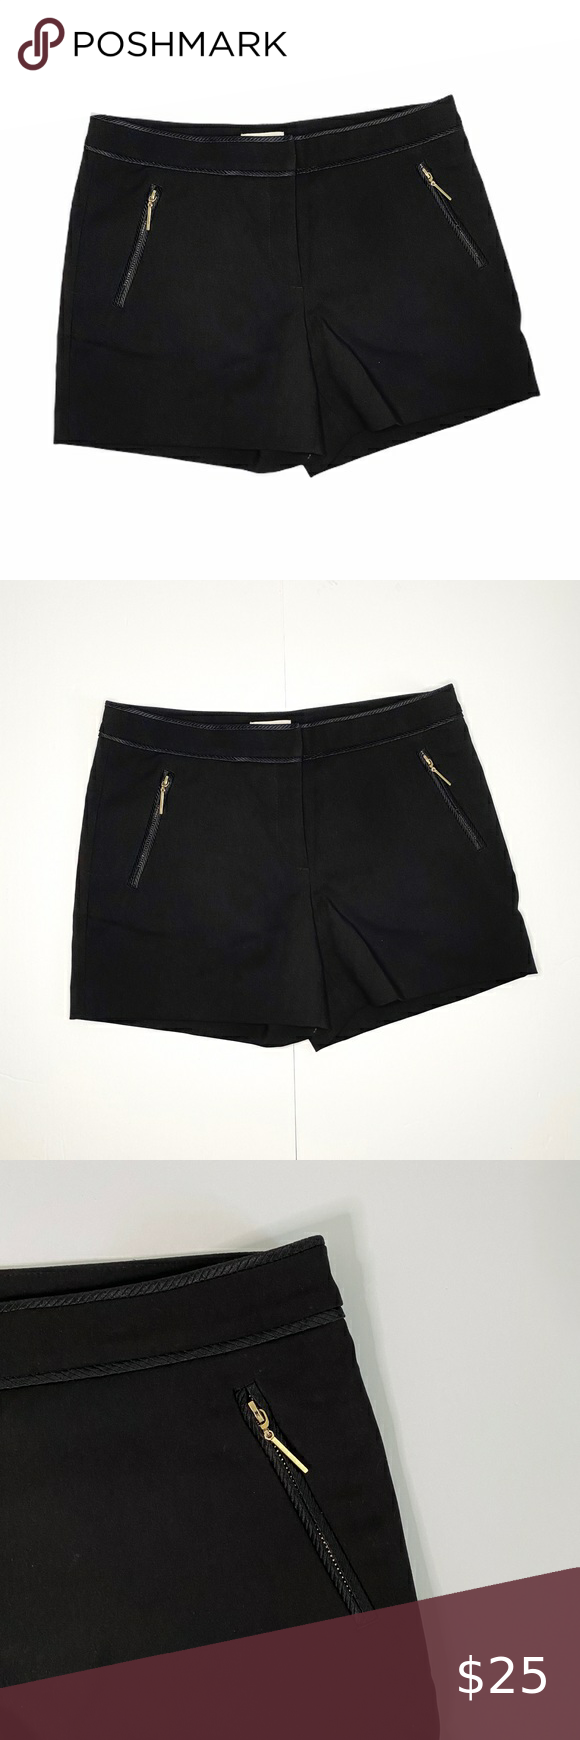 H M Black Zipper Pocket Polyester Dress Short Short Dresses Polyester Dress Black Short Dress [ 1740 x 580 Pixel ]